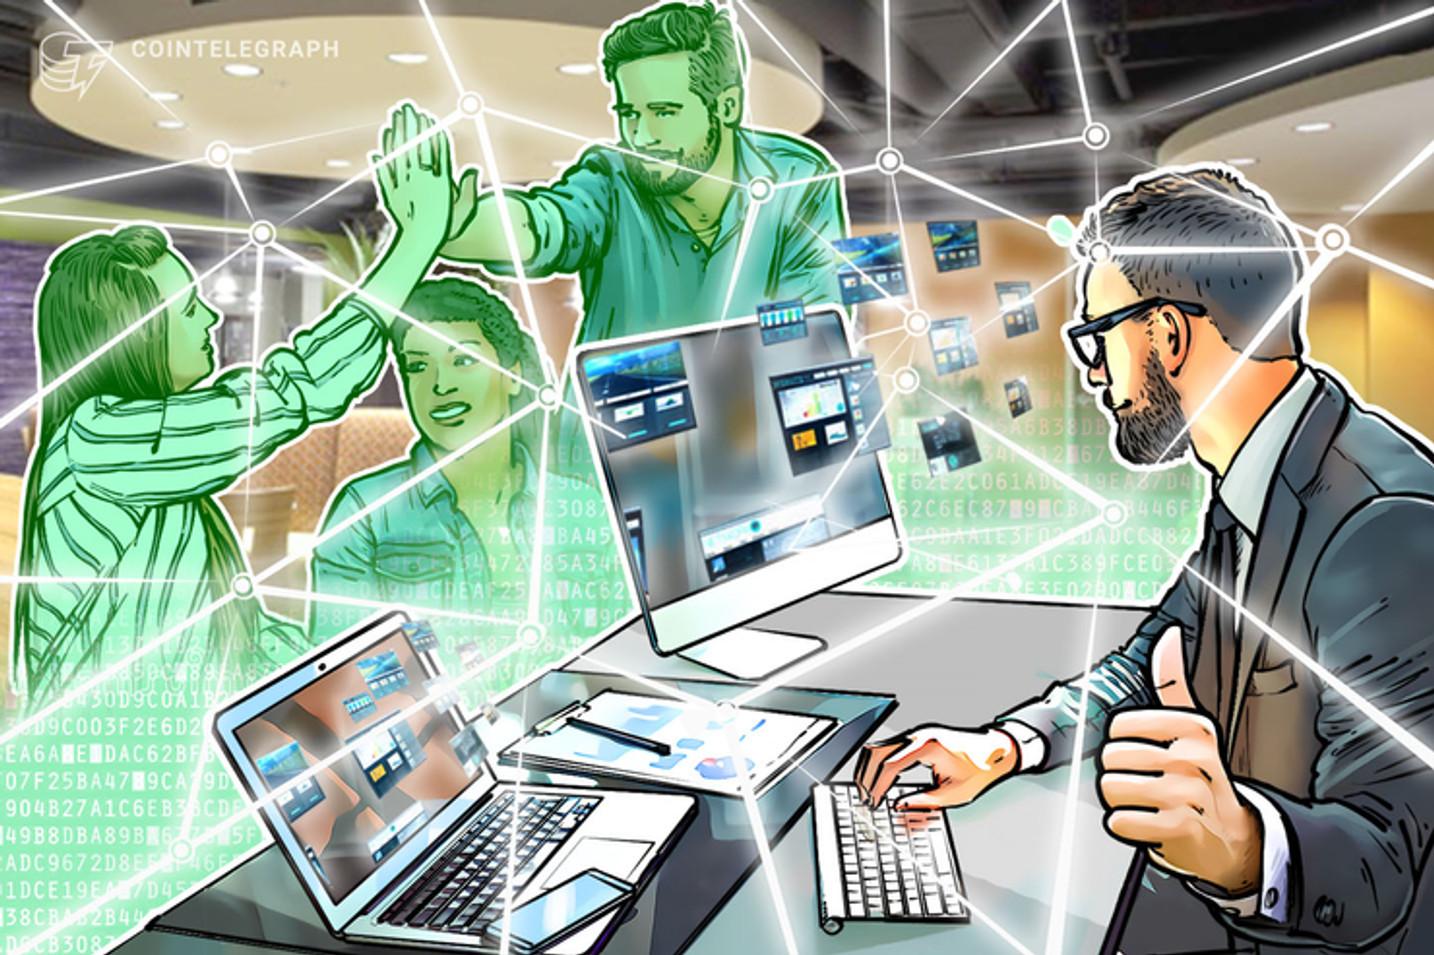 Kusama: Erstes Test-Net von Multichain-Protokoll Polkadot geht an den Start